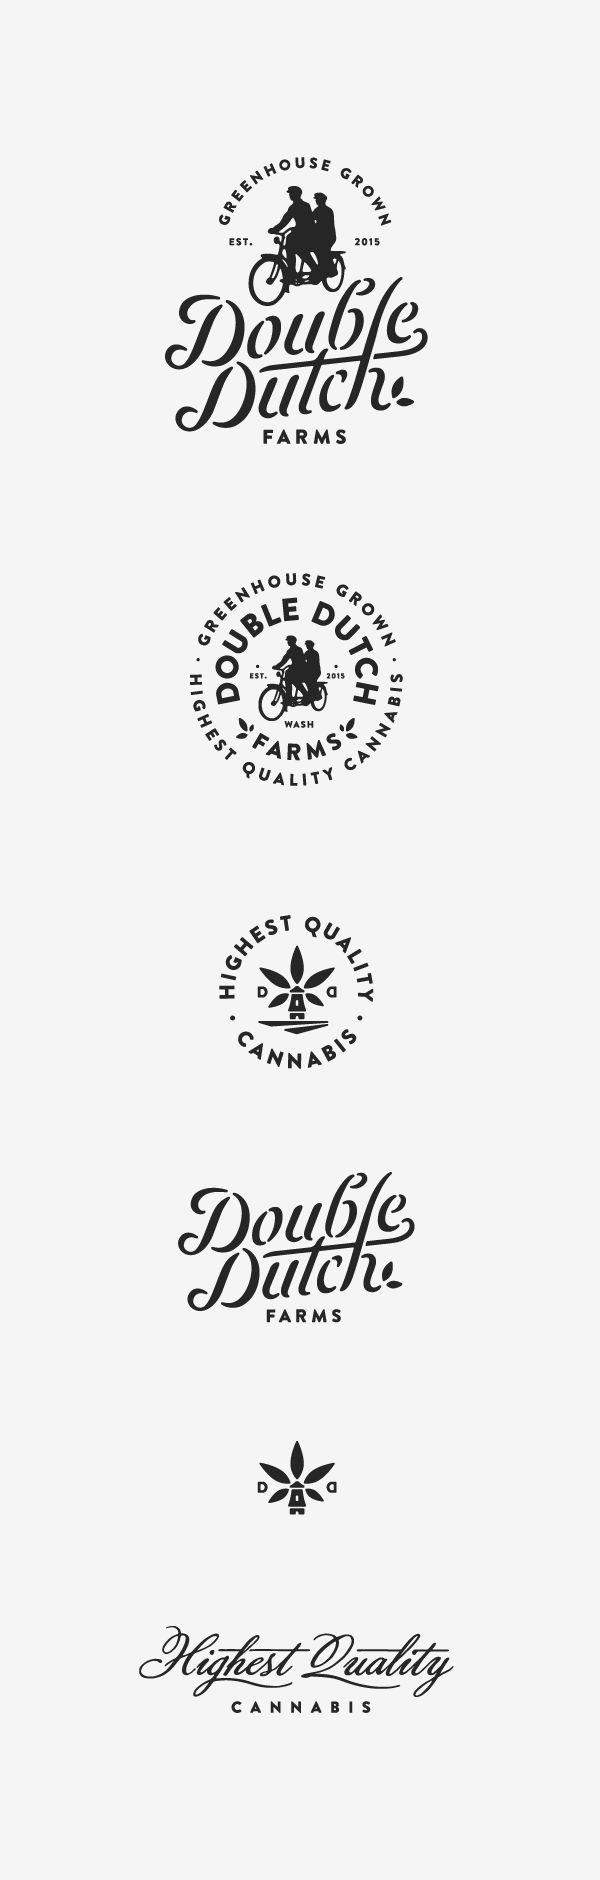 Double Dutch Farms Logos by Jared Jacob